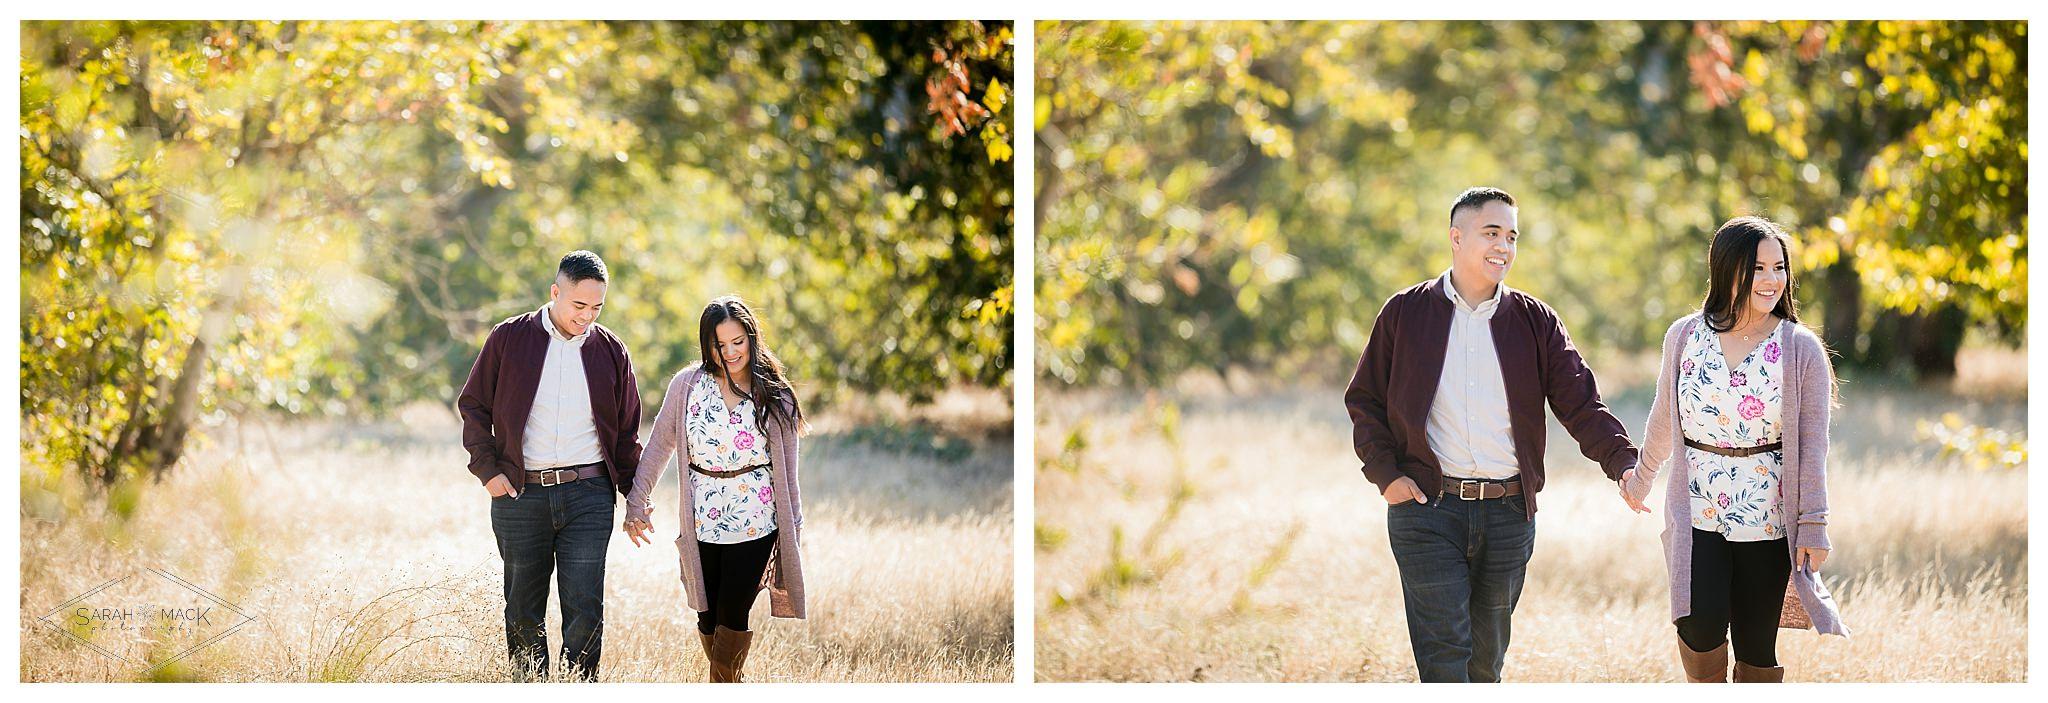 LE_Orange-County-Engagement-Photography 26.jpg